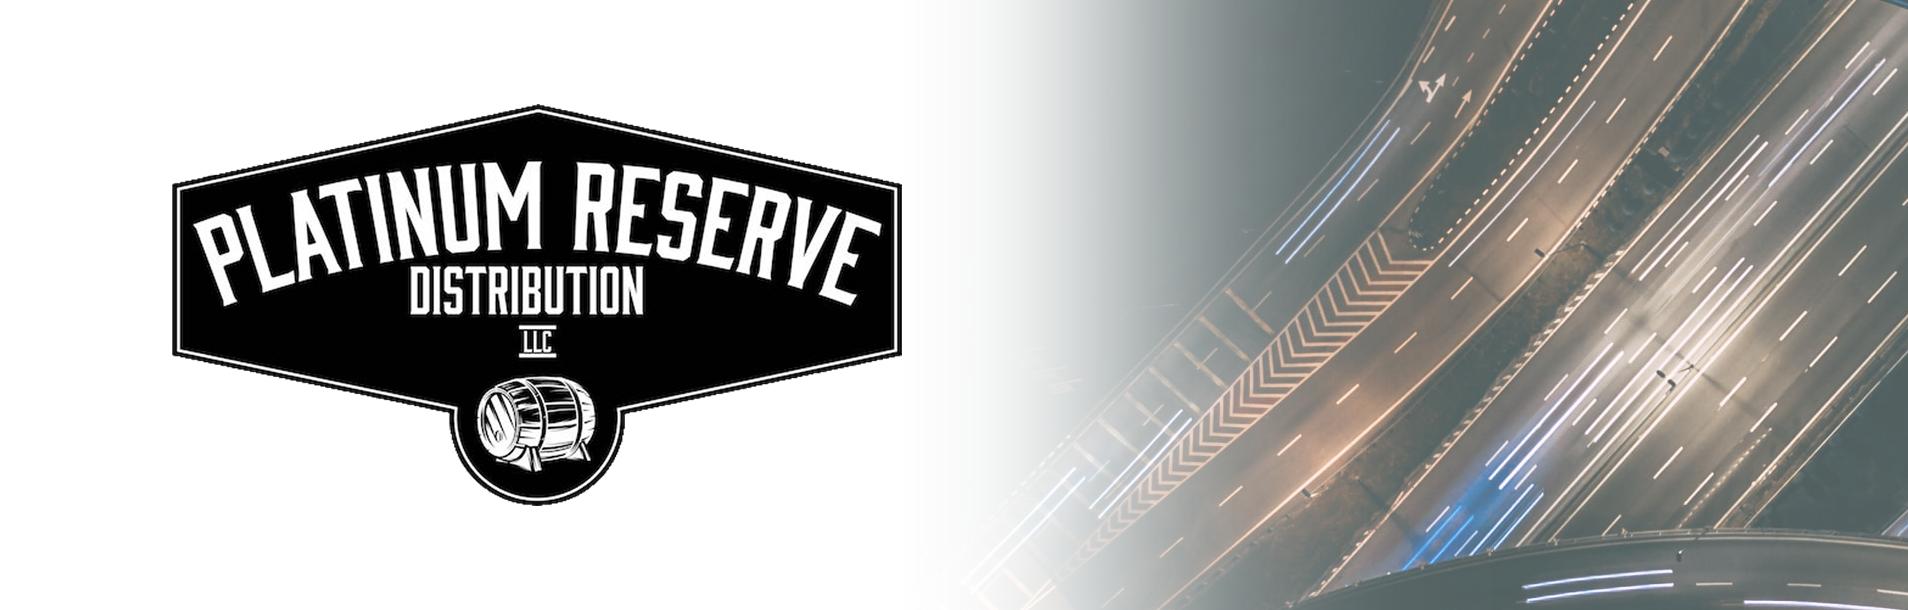 , Insider: Platinum Reserve Distribution, LLC | Hand Sanitizer